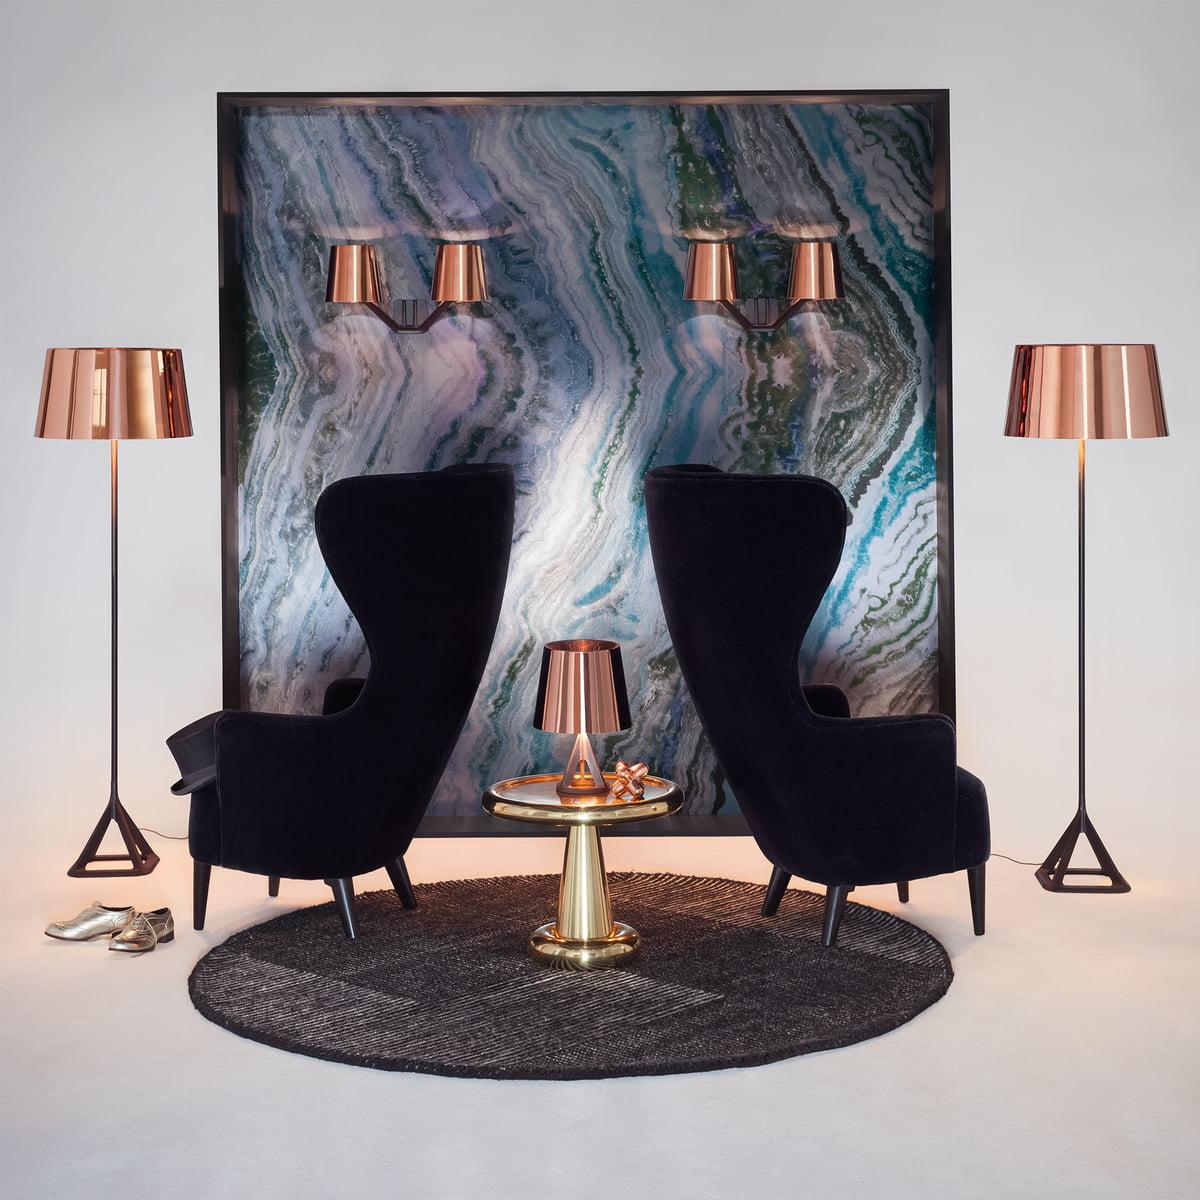 Base Wall Light Tom Dixon Shop - Tom dixon wingback chair